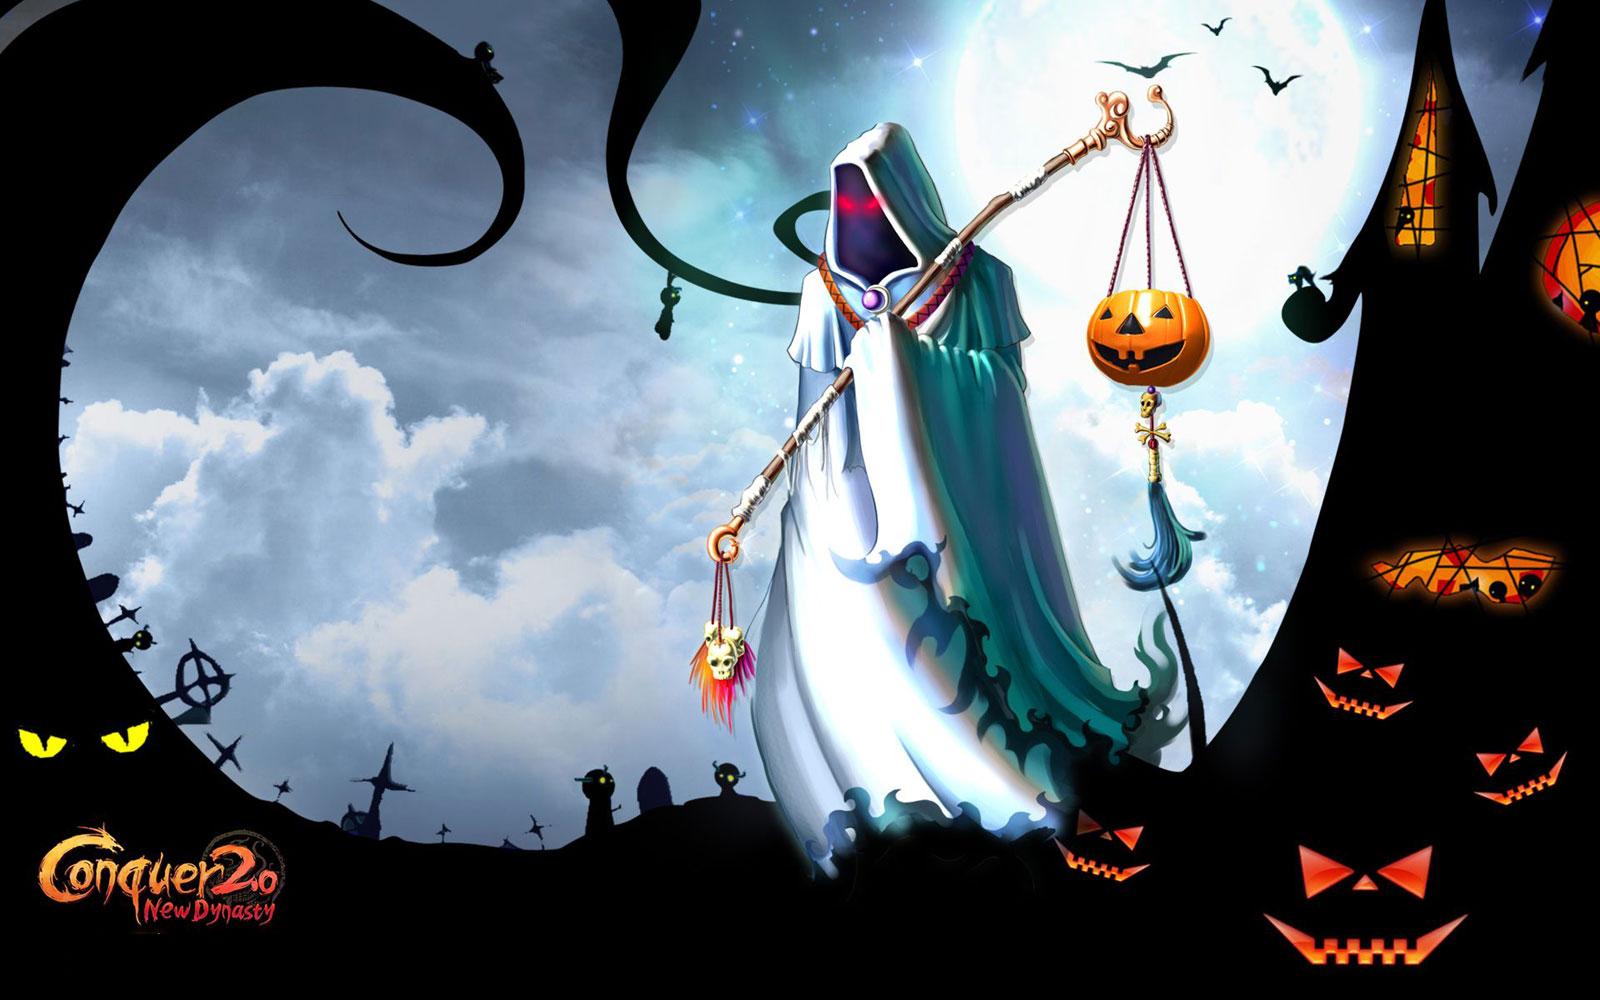 http://1.bp.blogspot.com/_m09pg-qwA3s/TMwM1F2_tvI/AAAAAAAAAC4/INwcXHu-JhA/s1600/wallpaper-halloween.jpg